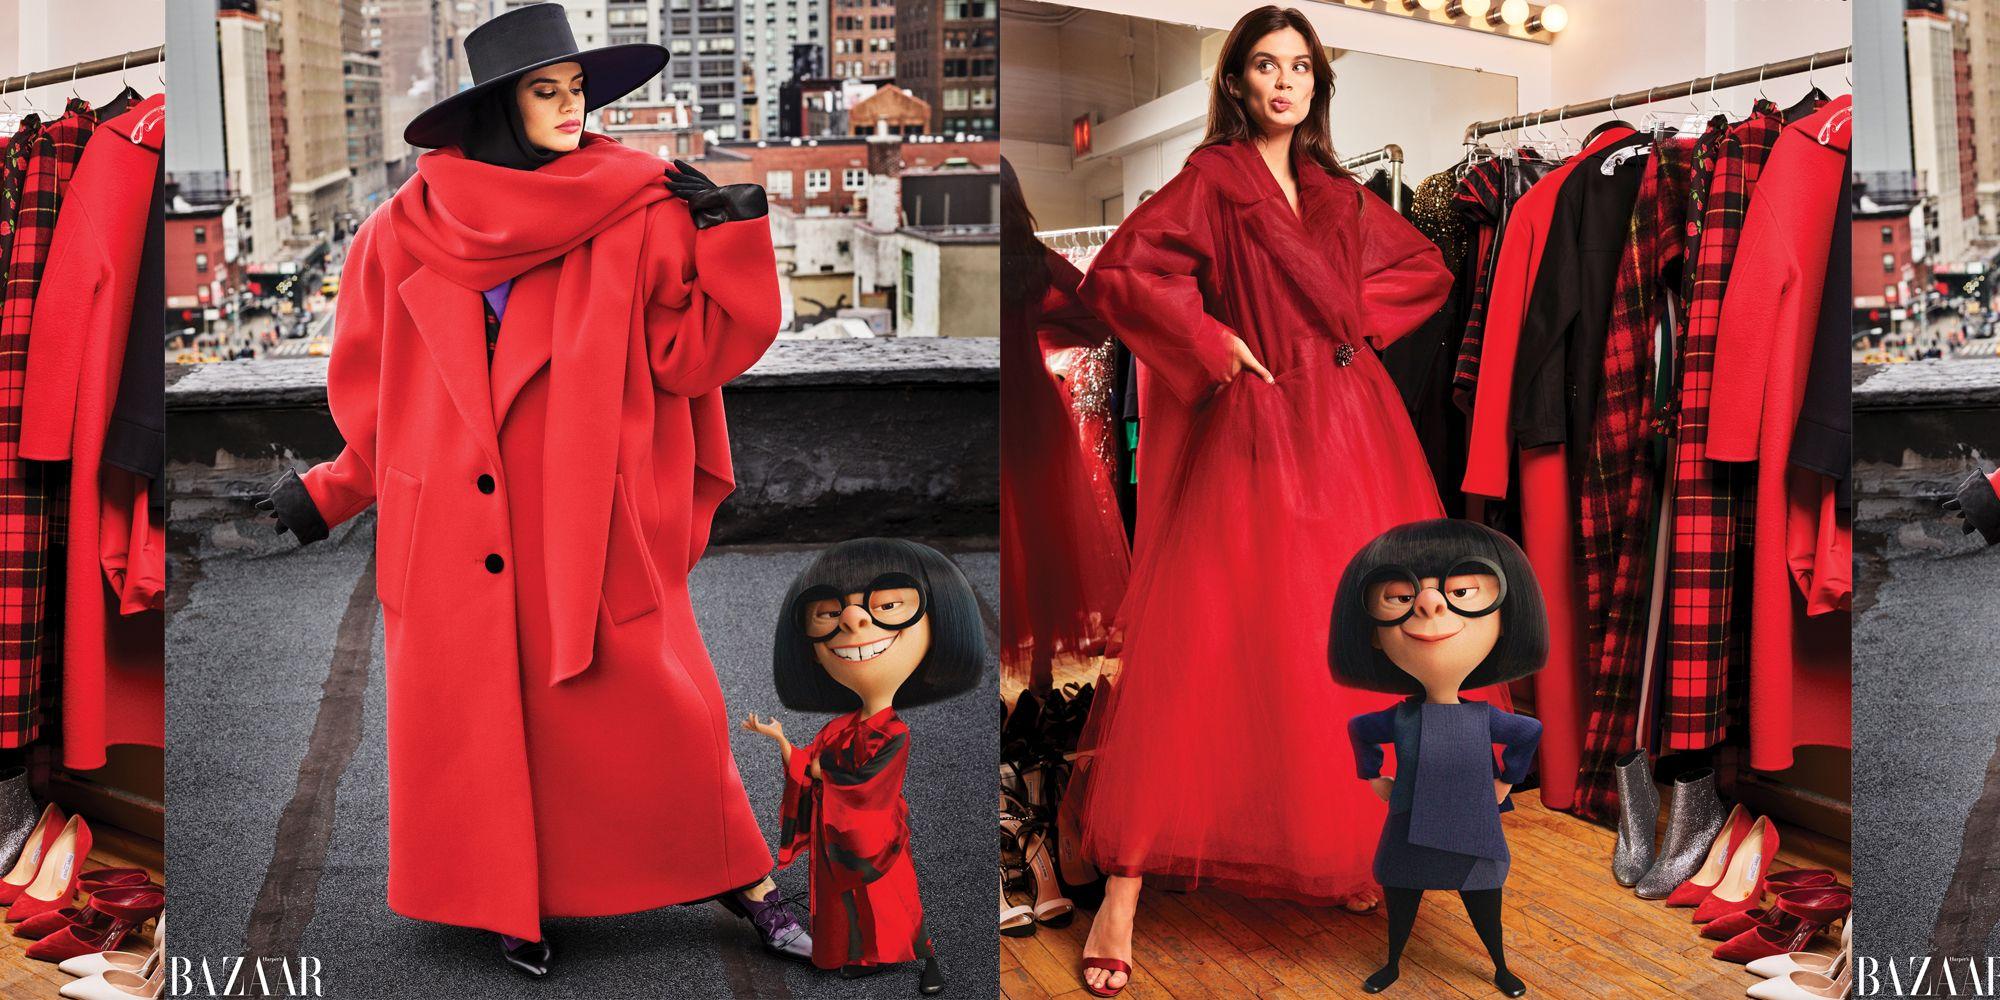 Disney S The Incredibles Edna Mode Edna Mode In Harper S Bazaar With Sara Sampaio